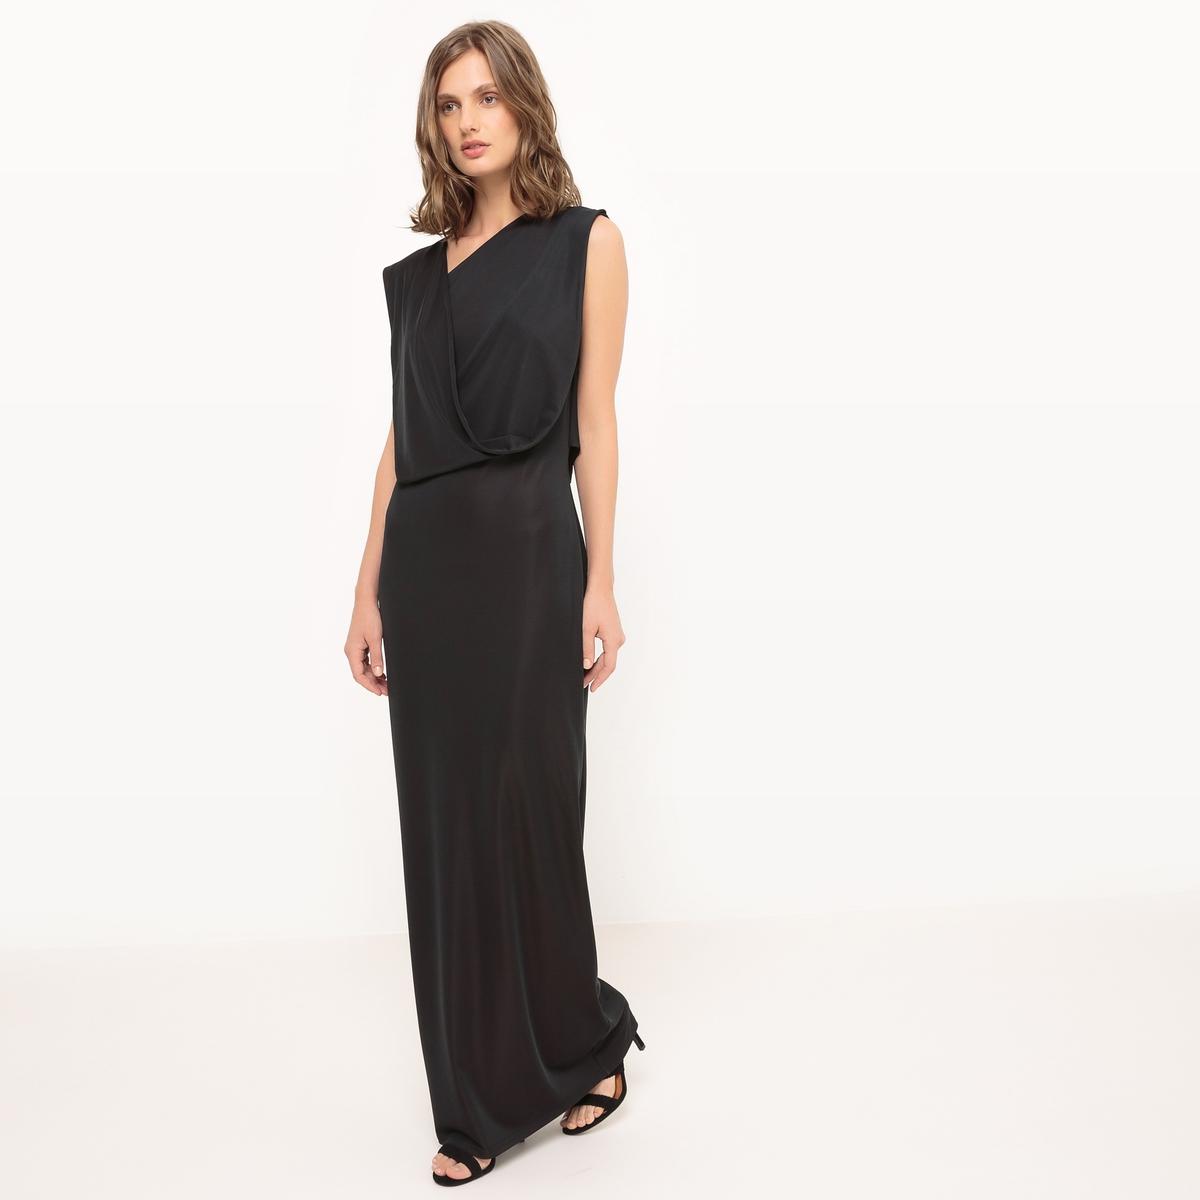 MANON VANDRISSE POUR LA REDOUTE Платье длинное без рукавов